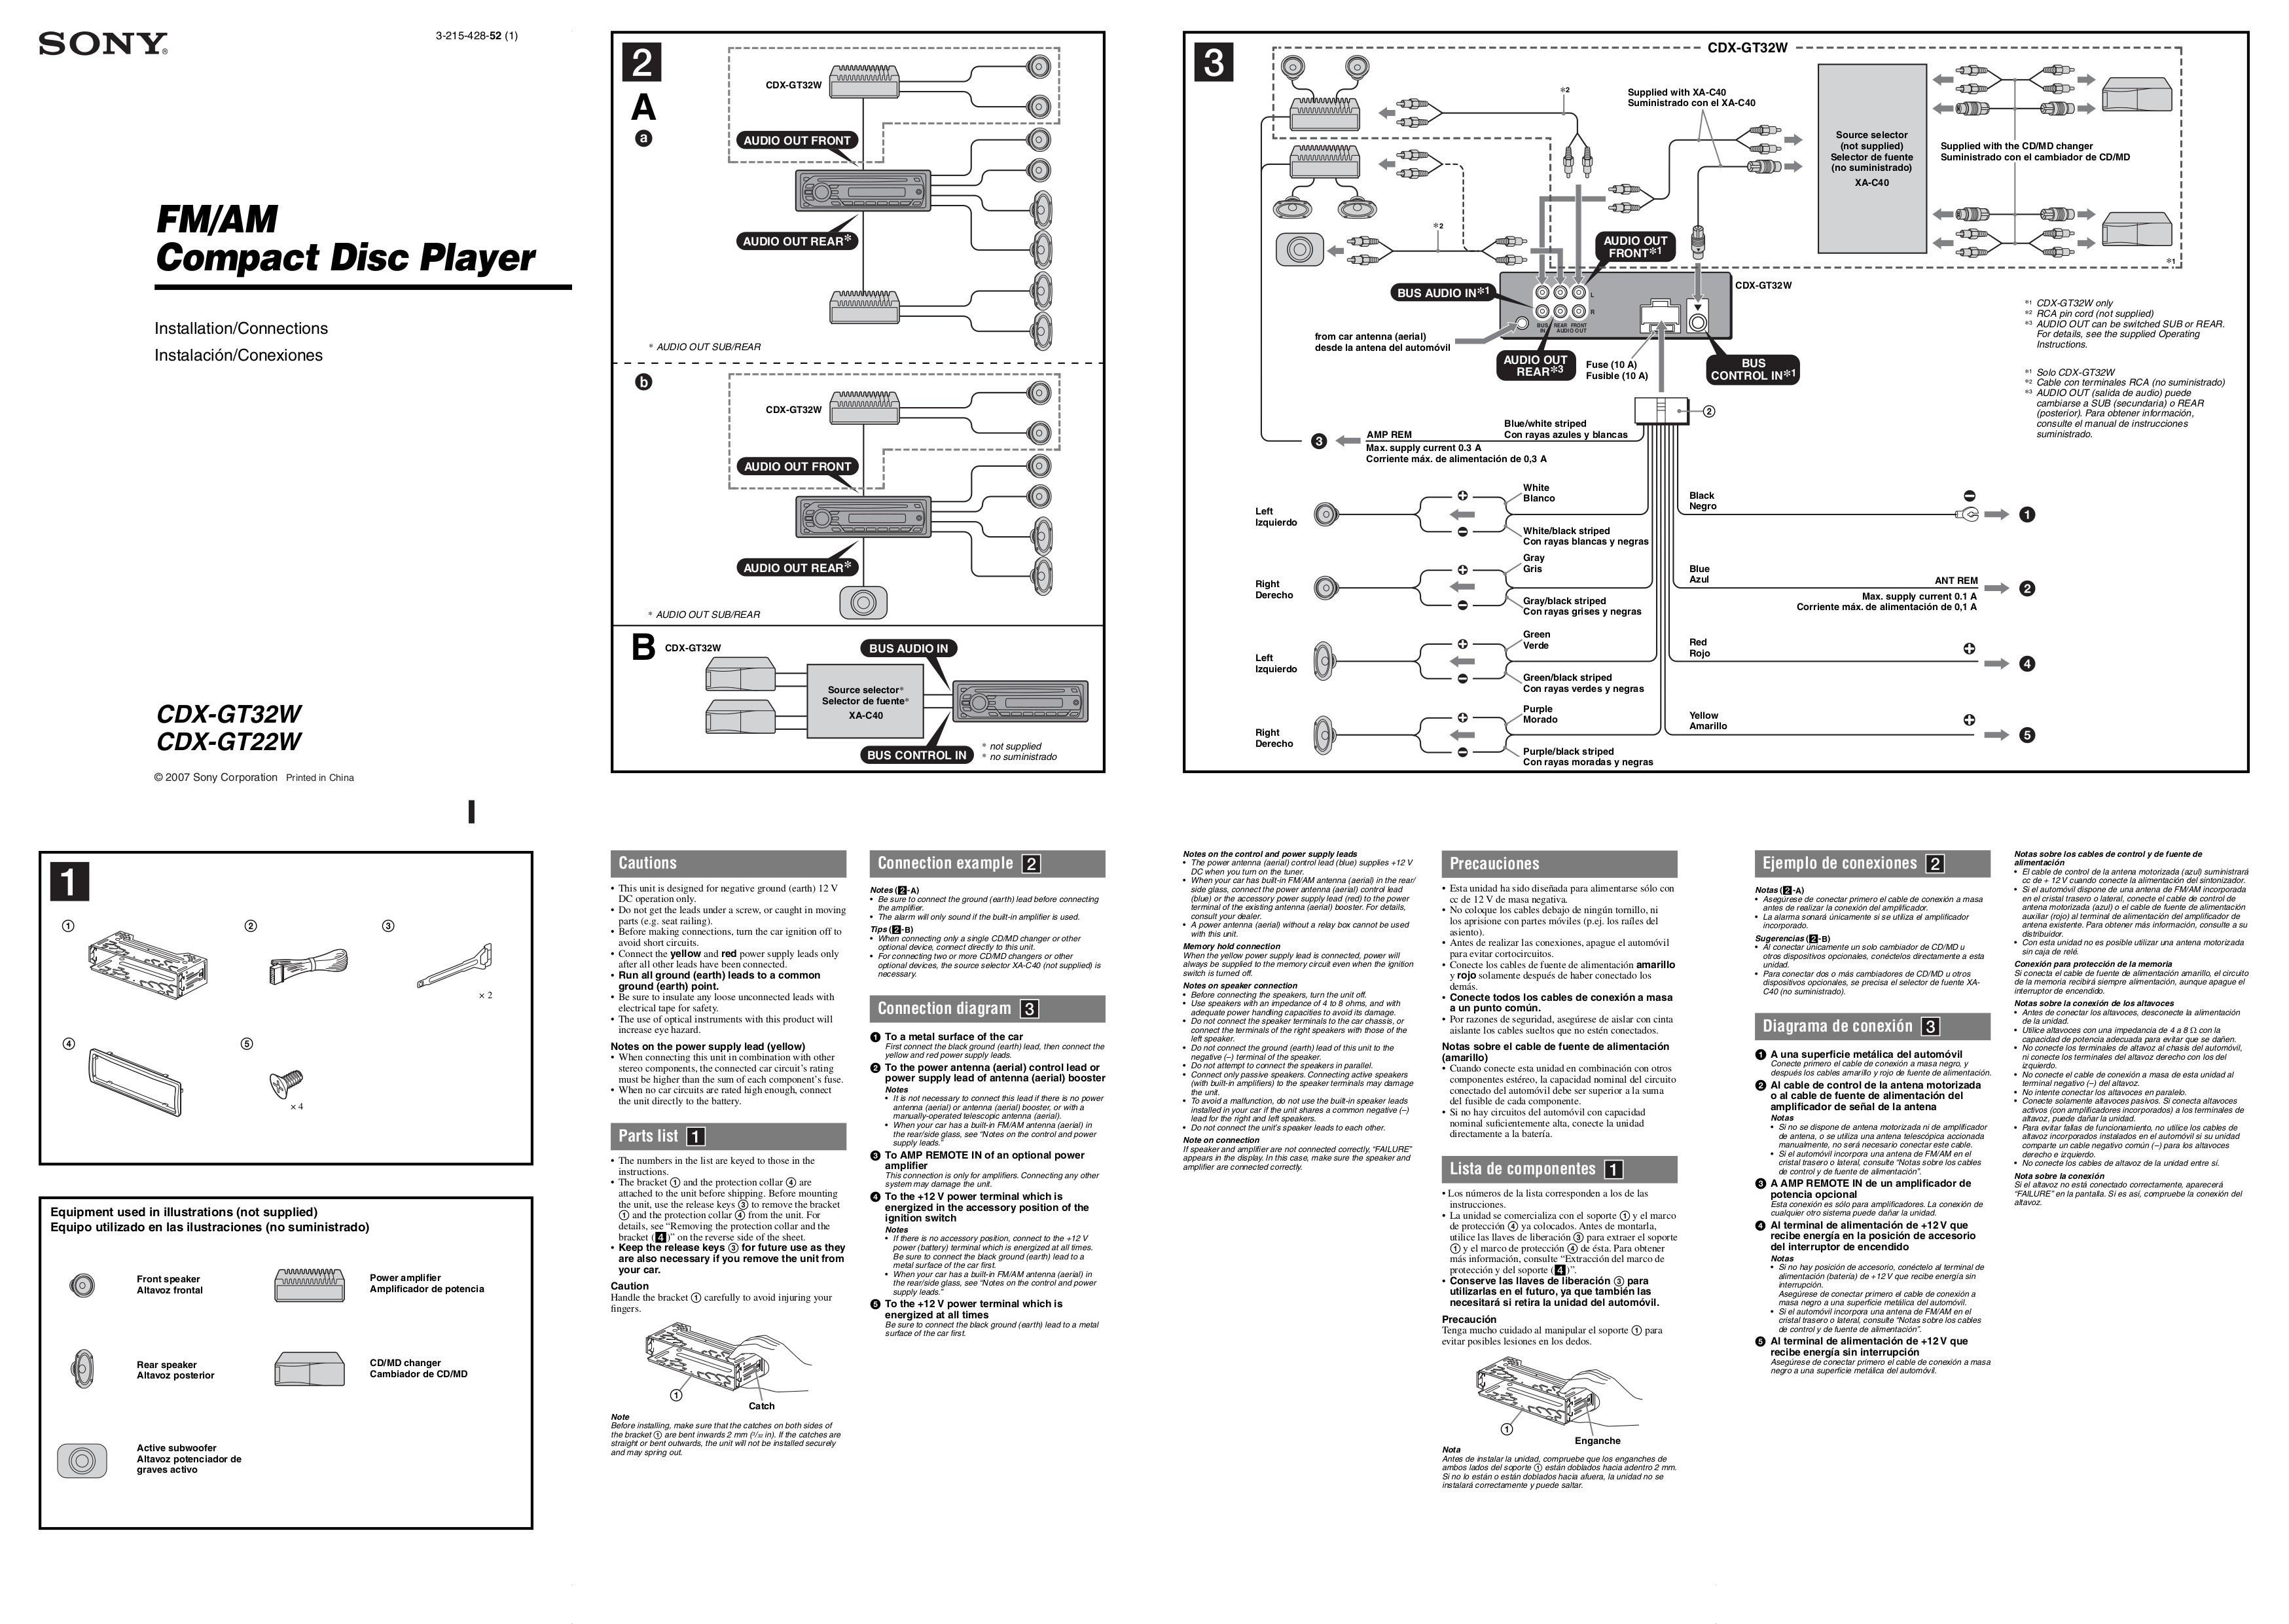 Wiring Diagram for sony Xplod Car Stereo sony Xplod Wiring Diagrams Fresh Diagram for Radio Amazing Cdx Of Wiring Diagram for sony Xplod Car Stereo